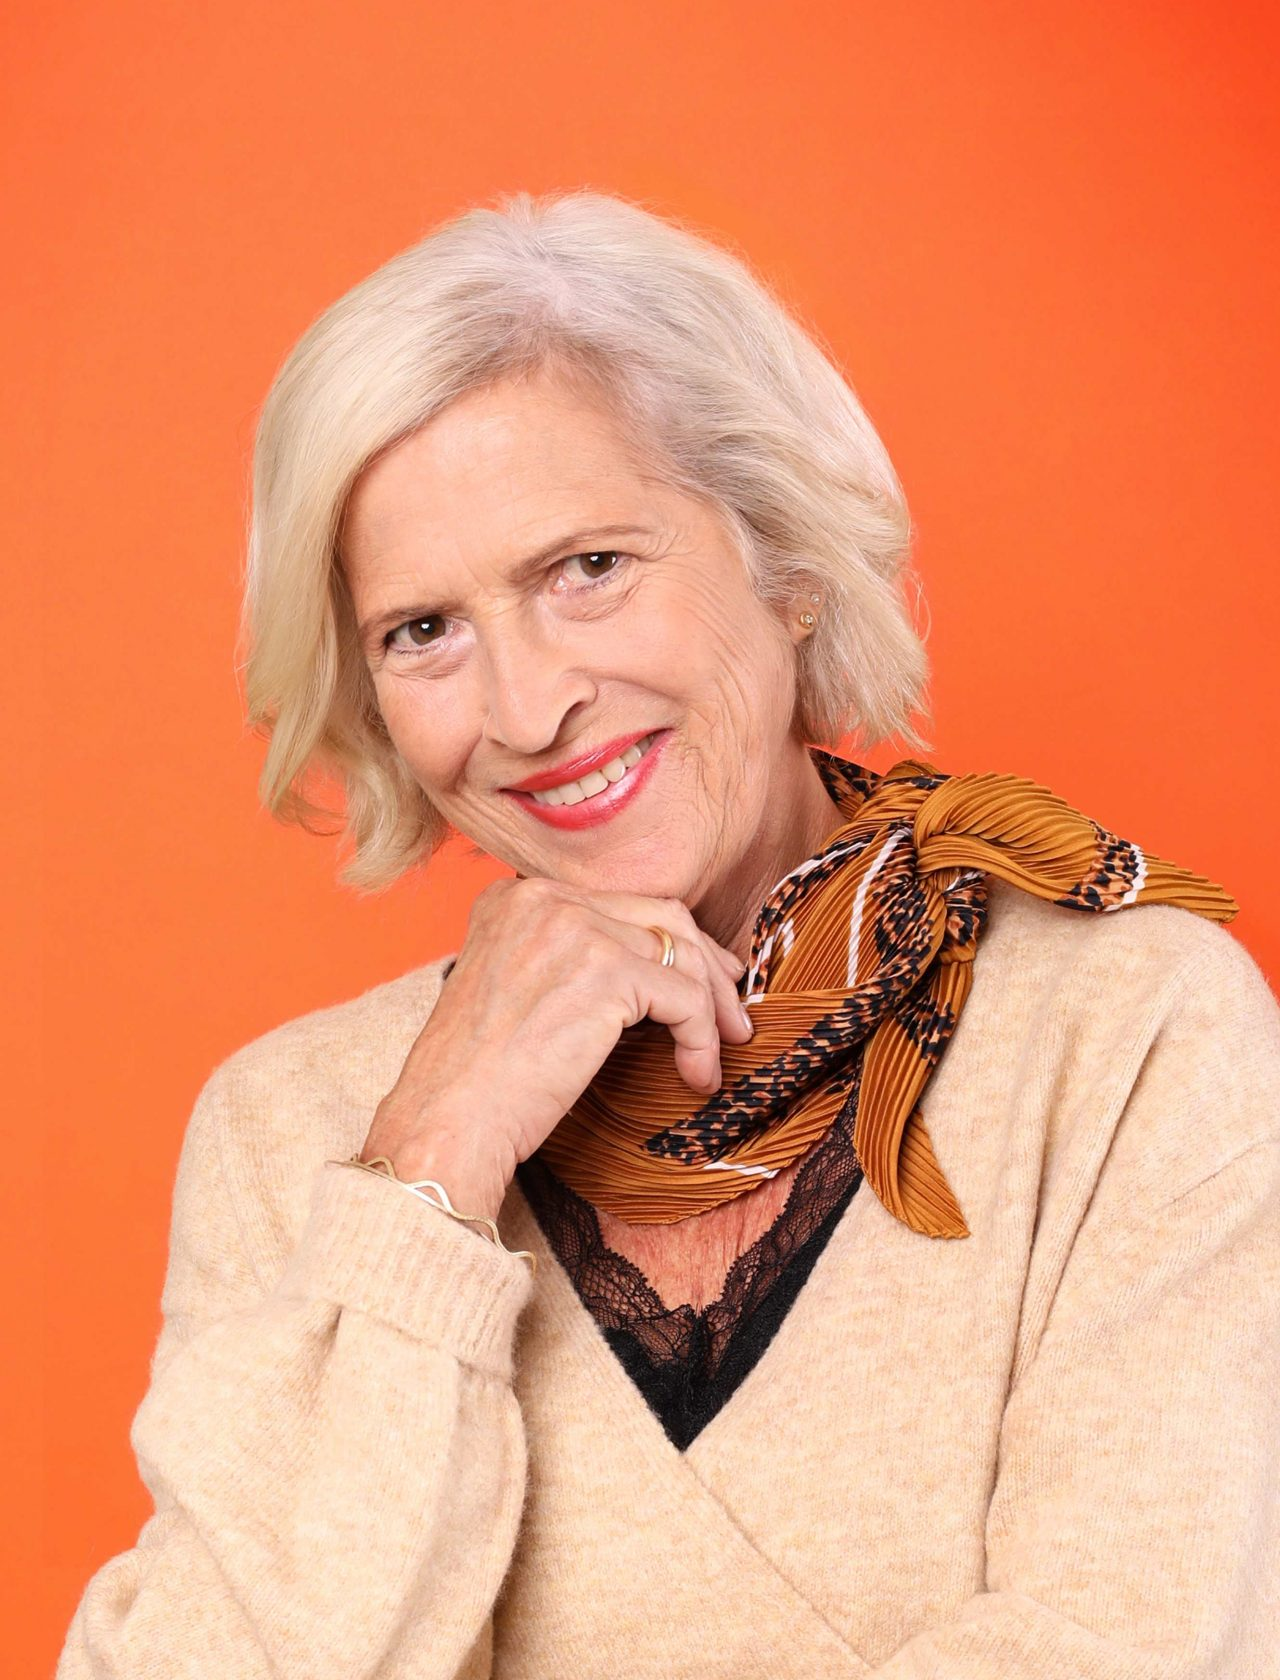 Ältere Frau vor oranger Wand